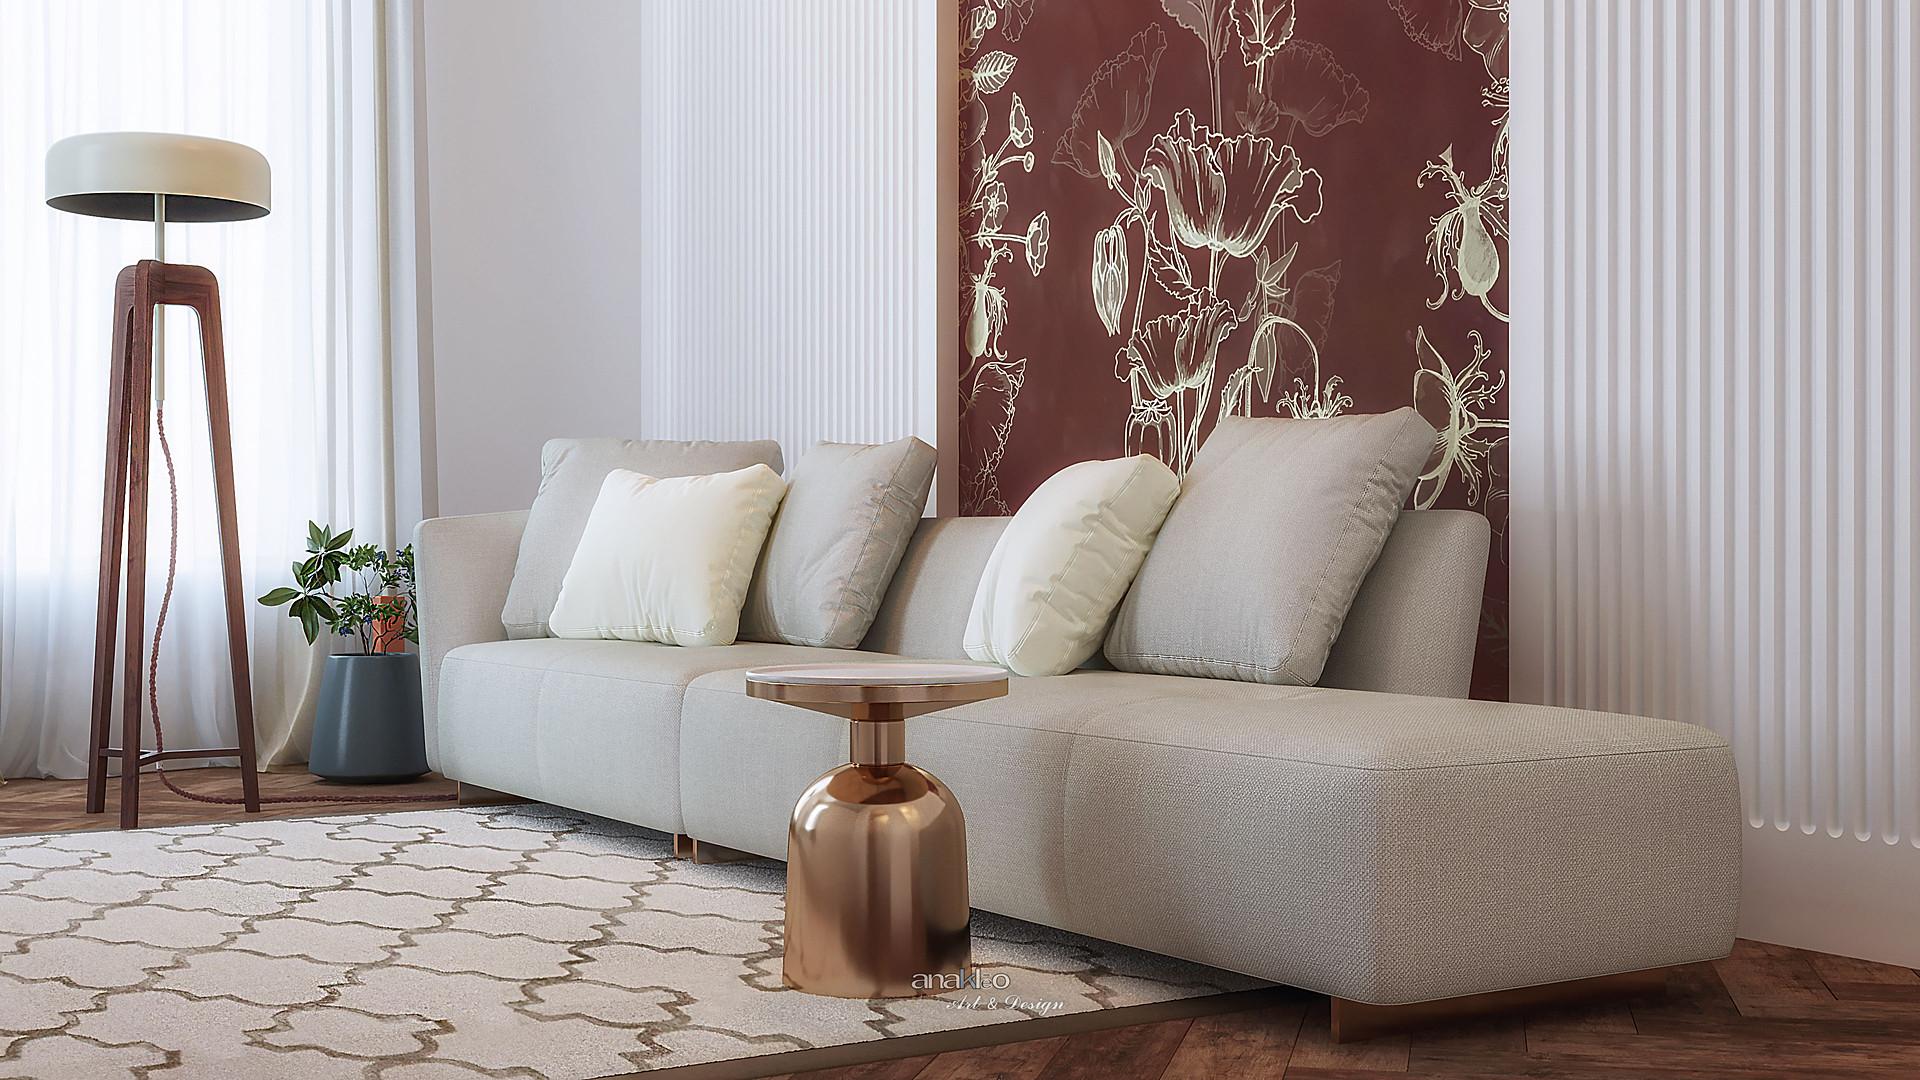 botanical-interior-wallpaper-decor-anakl